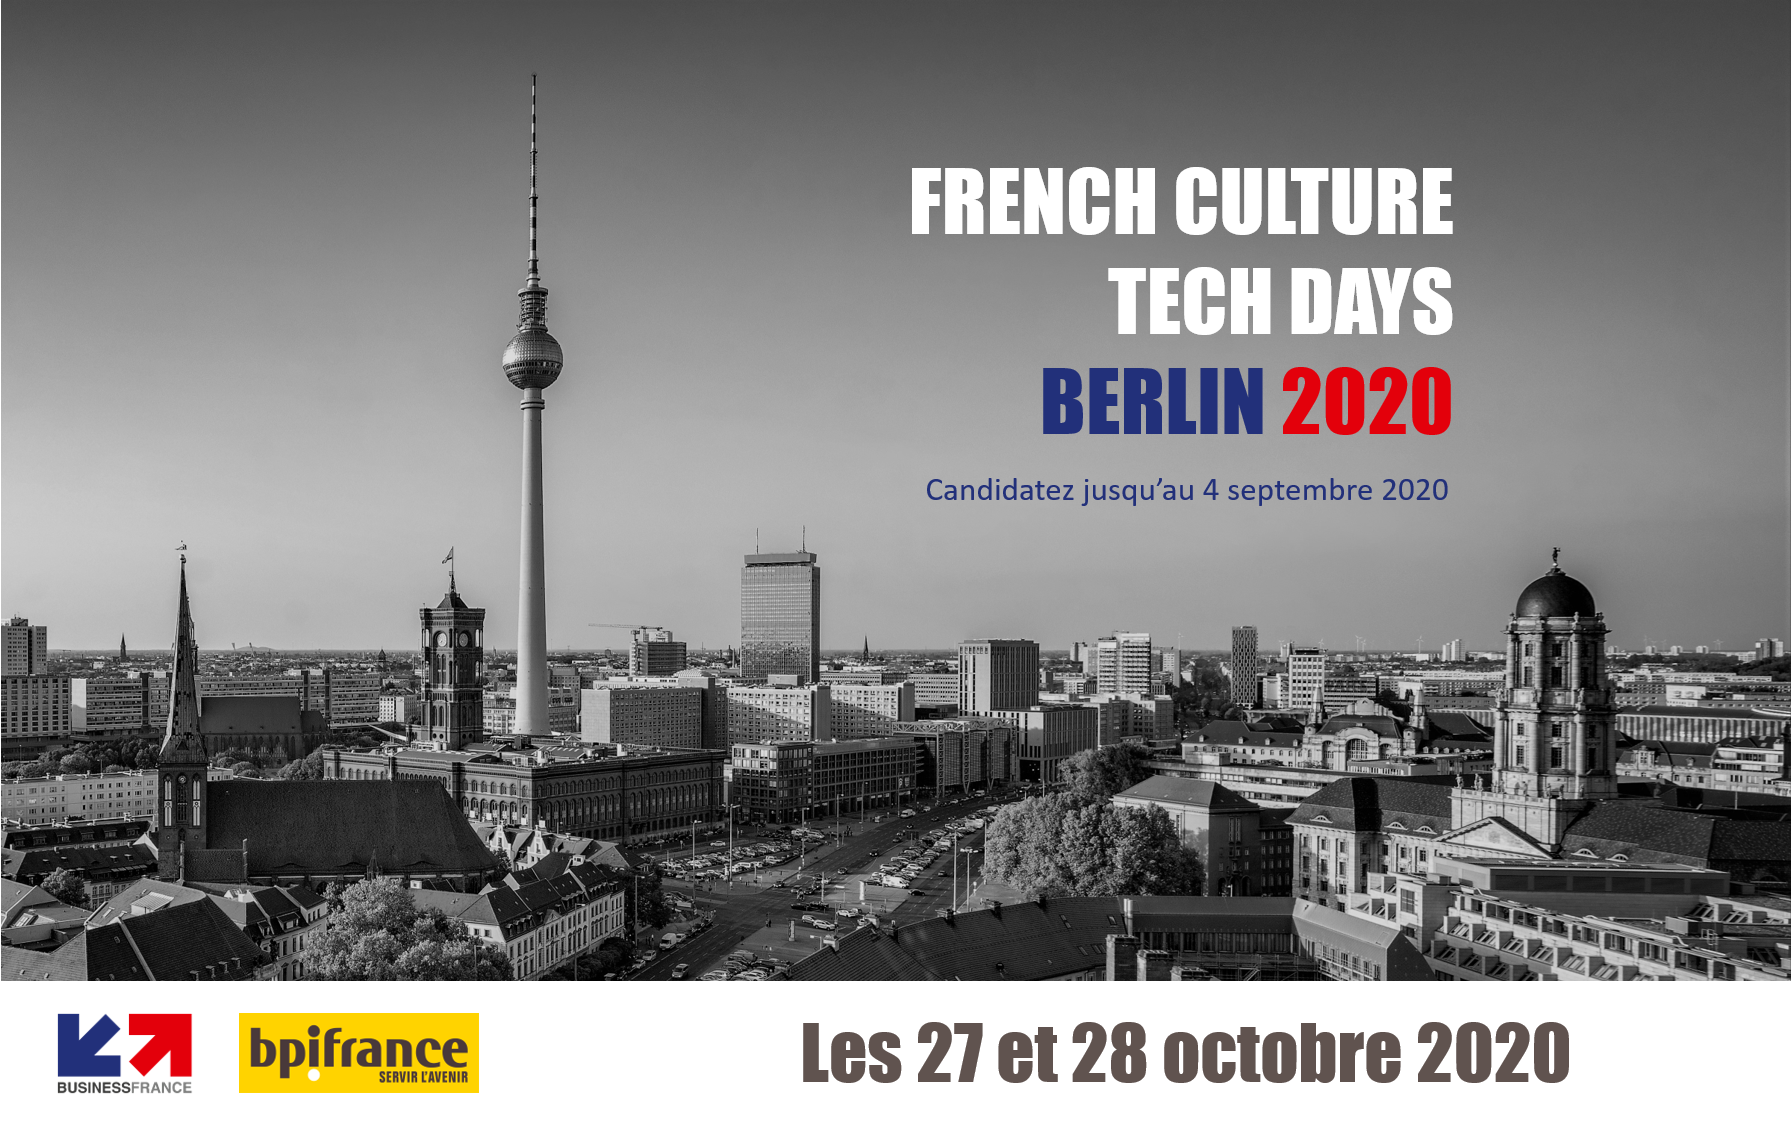 French Culture Tech Days Germany Berlin 2020 – Candidatez avant le 4 septembre